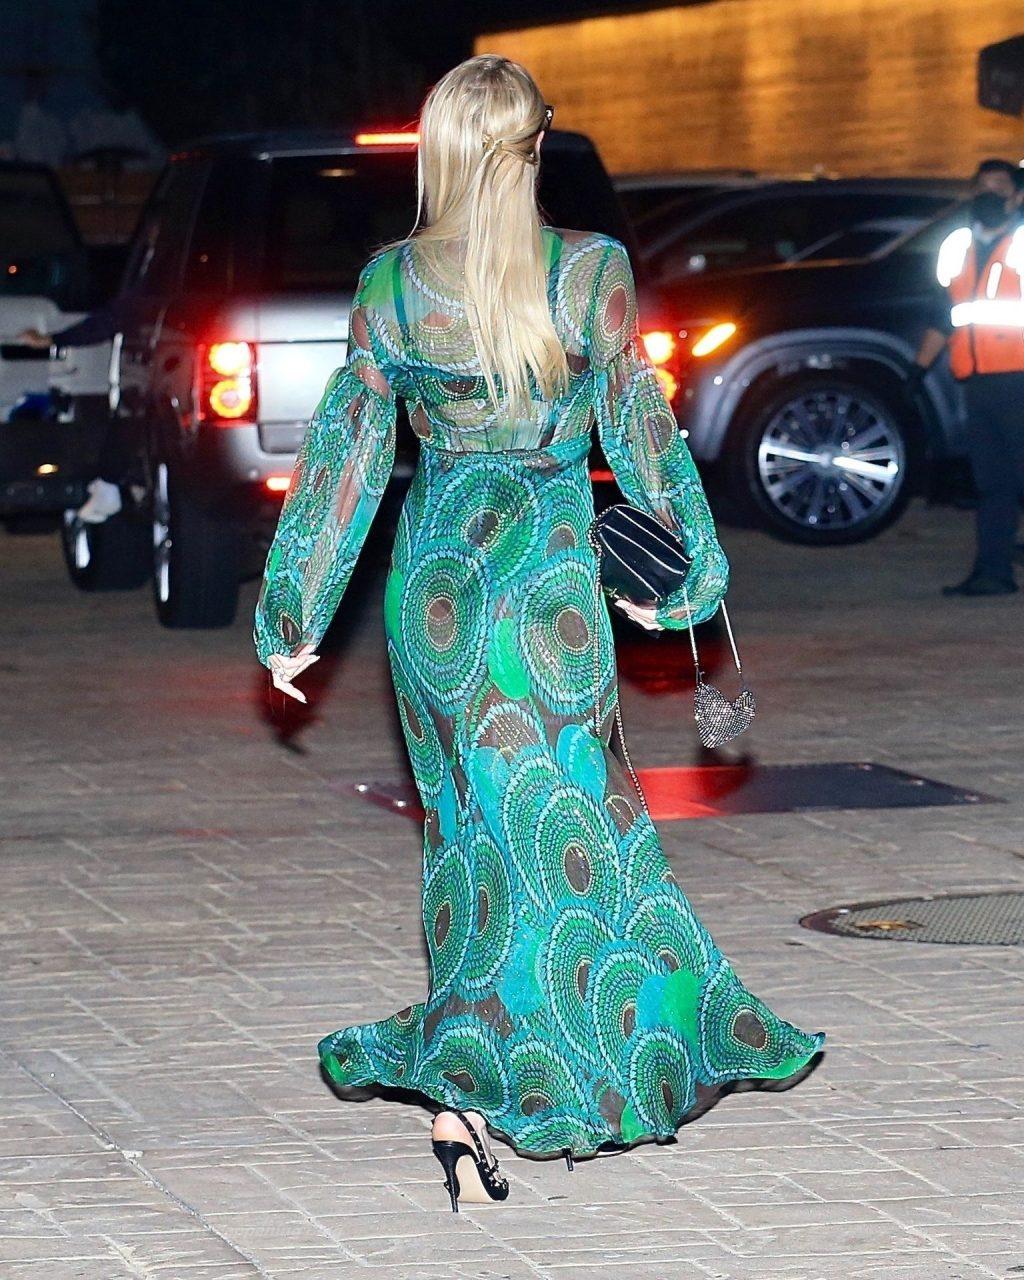 Leggy Paris Hilton Has Dinner at Nobu with Her Mom and Dad (70 Photos)